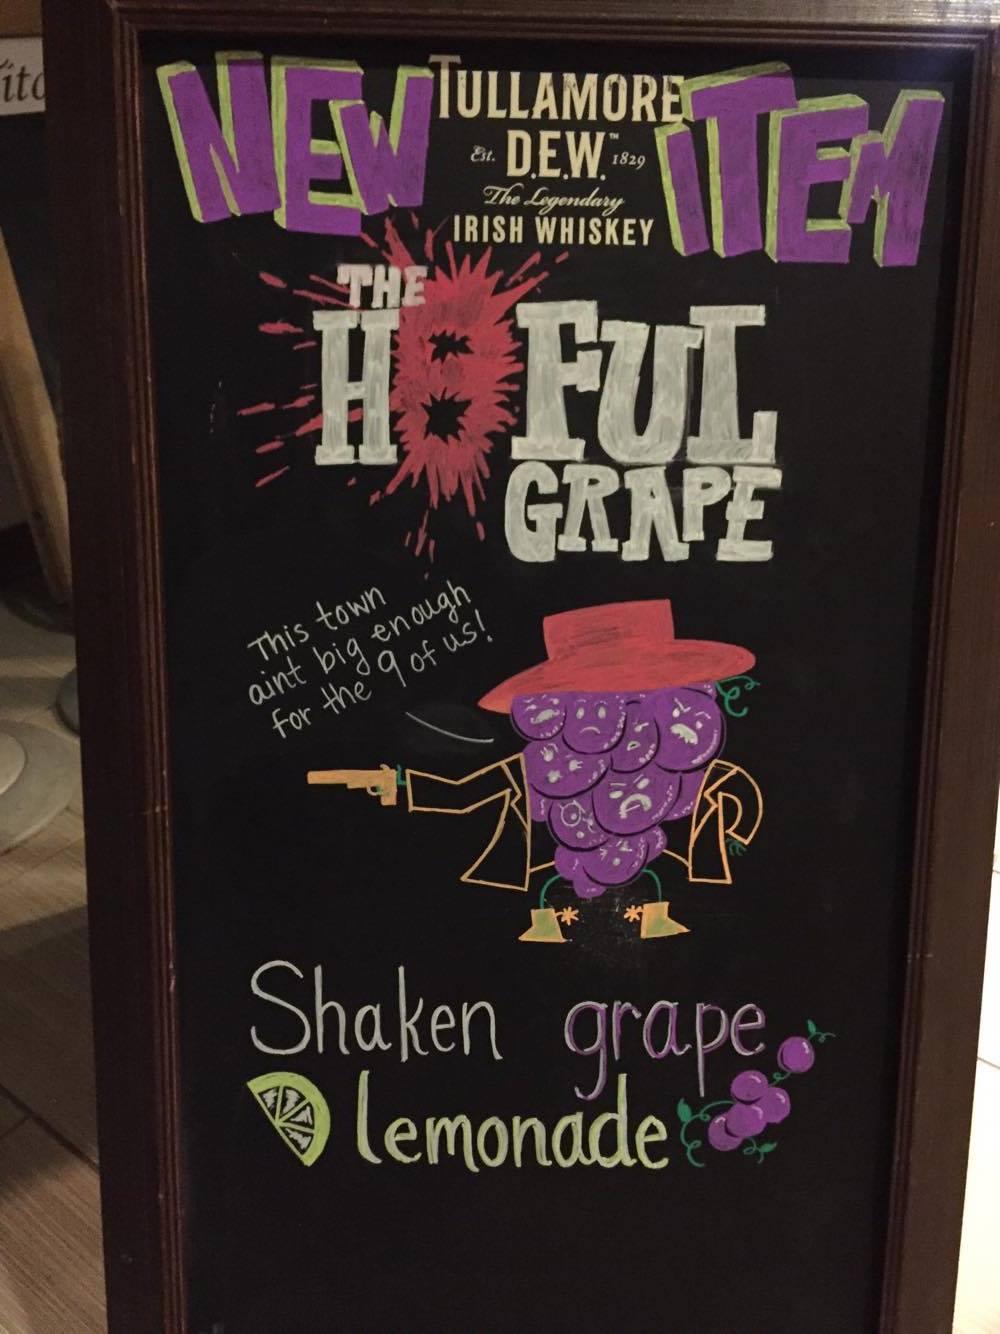 Hateful Grape